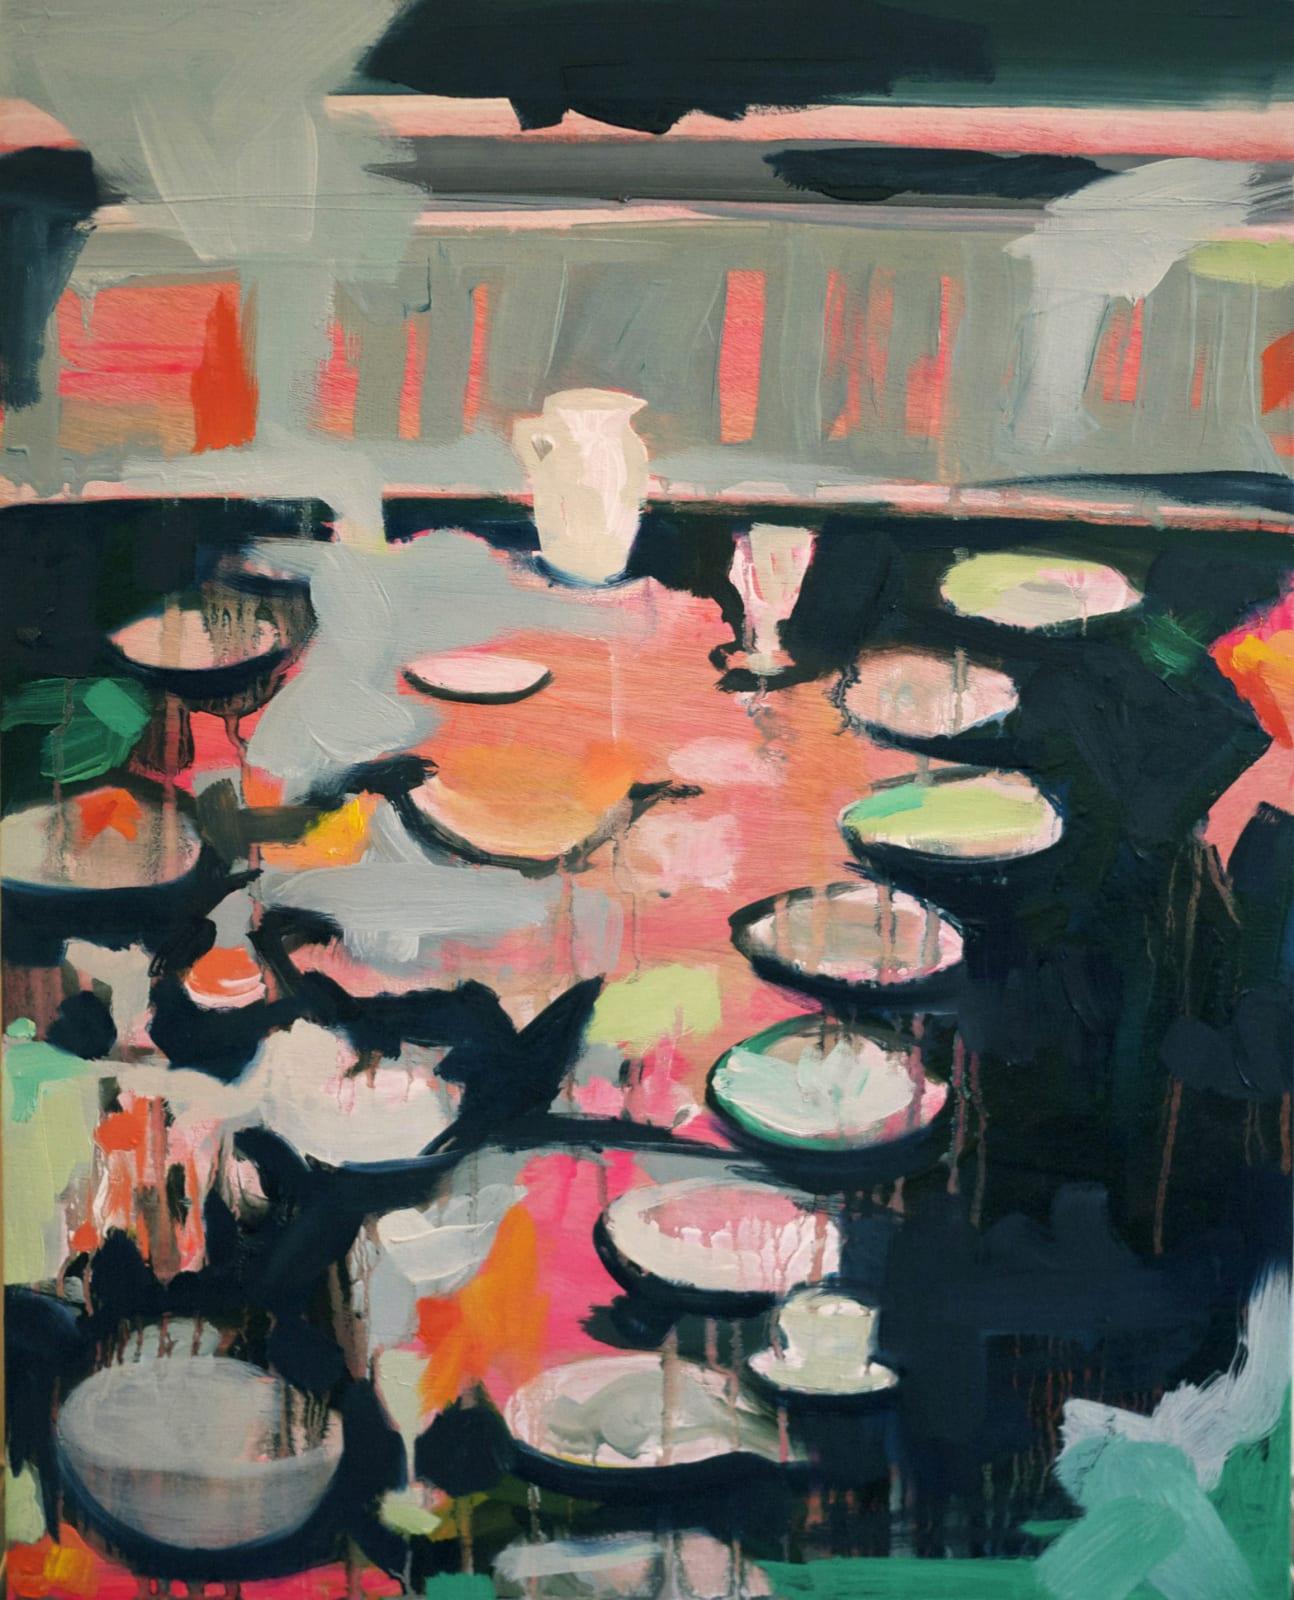 Elizabeth Schwaiger, Dinner Diner II, 2012